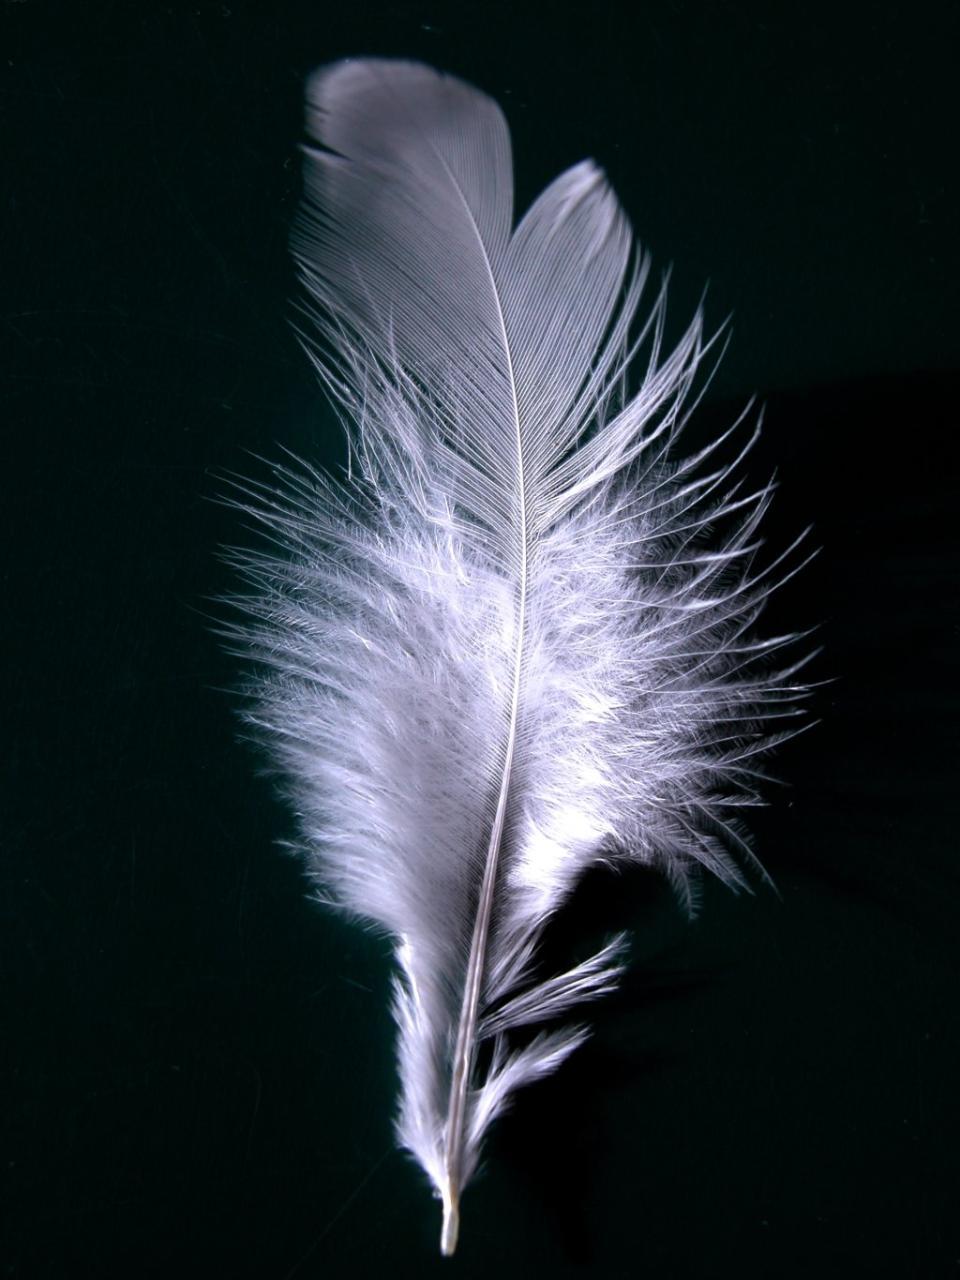 A_single_white_feather_closeup.jpg